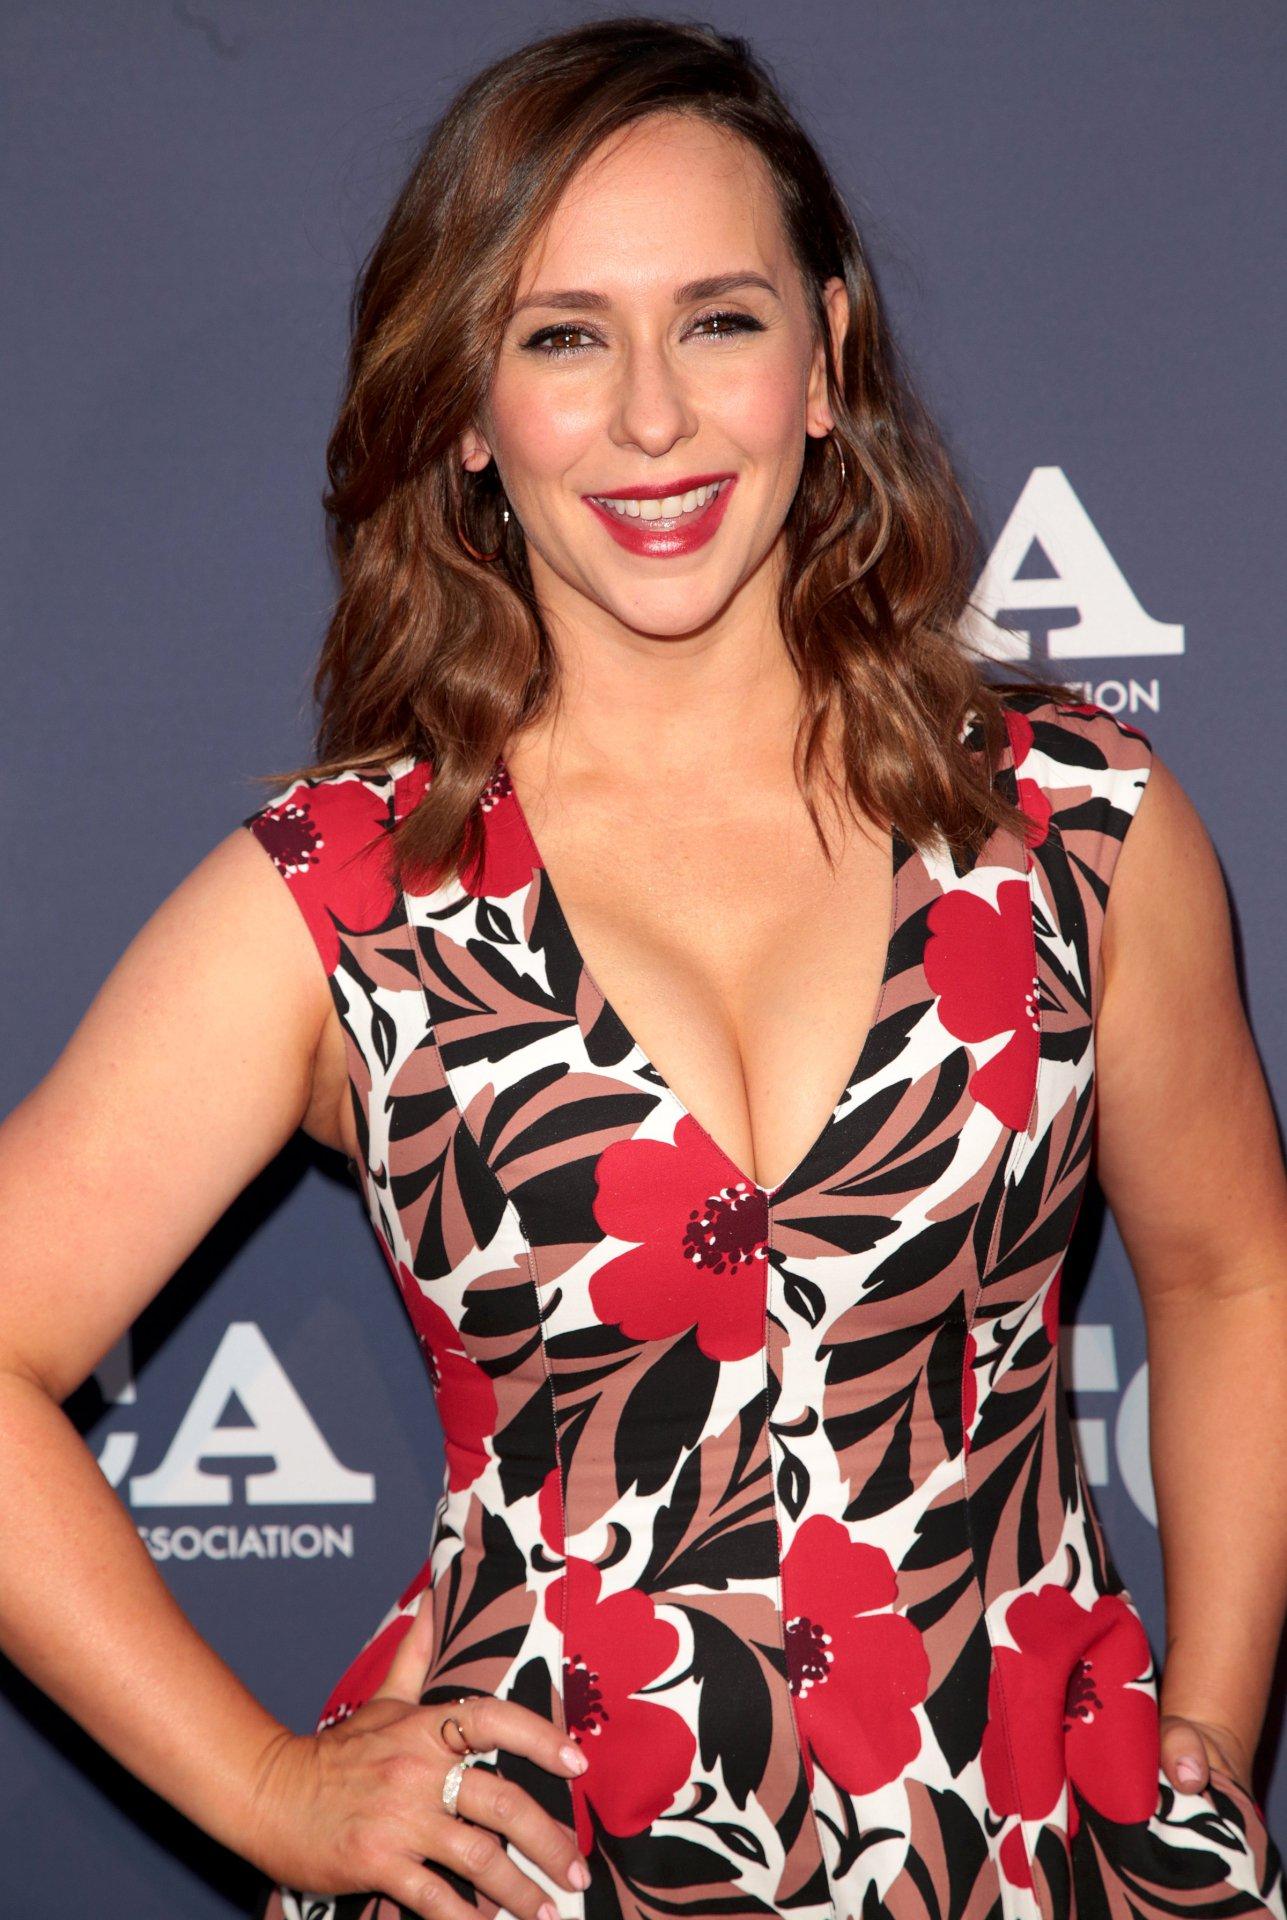 Jennifer Love Hewitt Big Boobs At Fox All Star Party | Hot Celebs Home